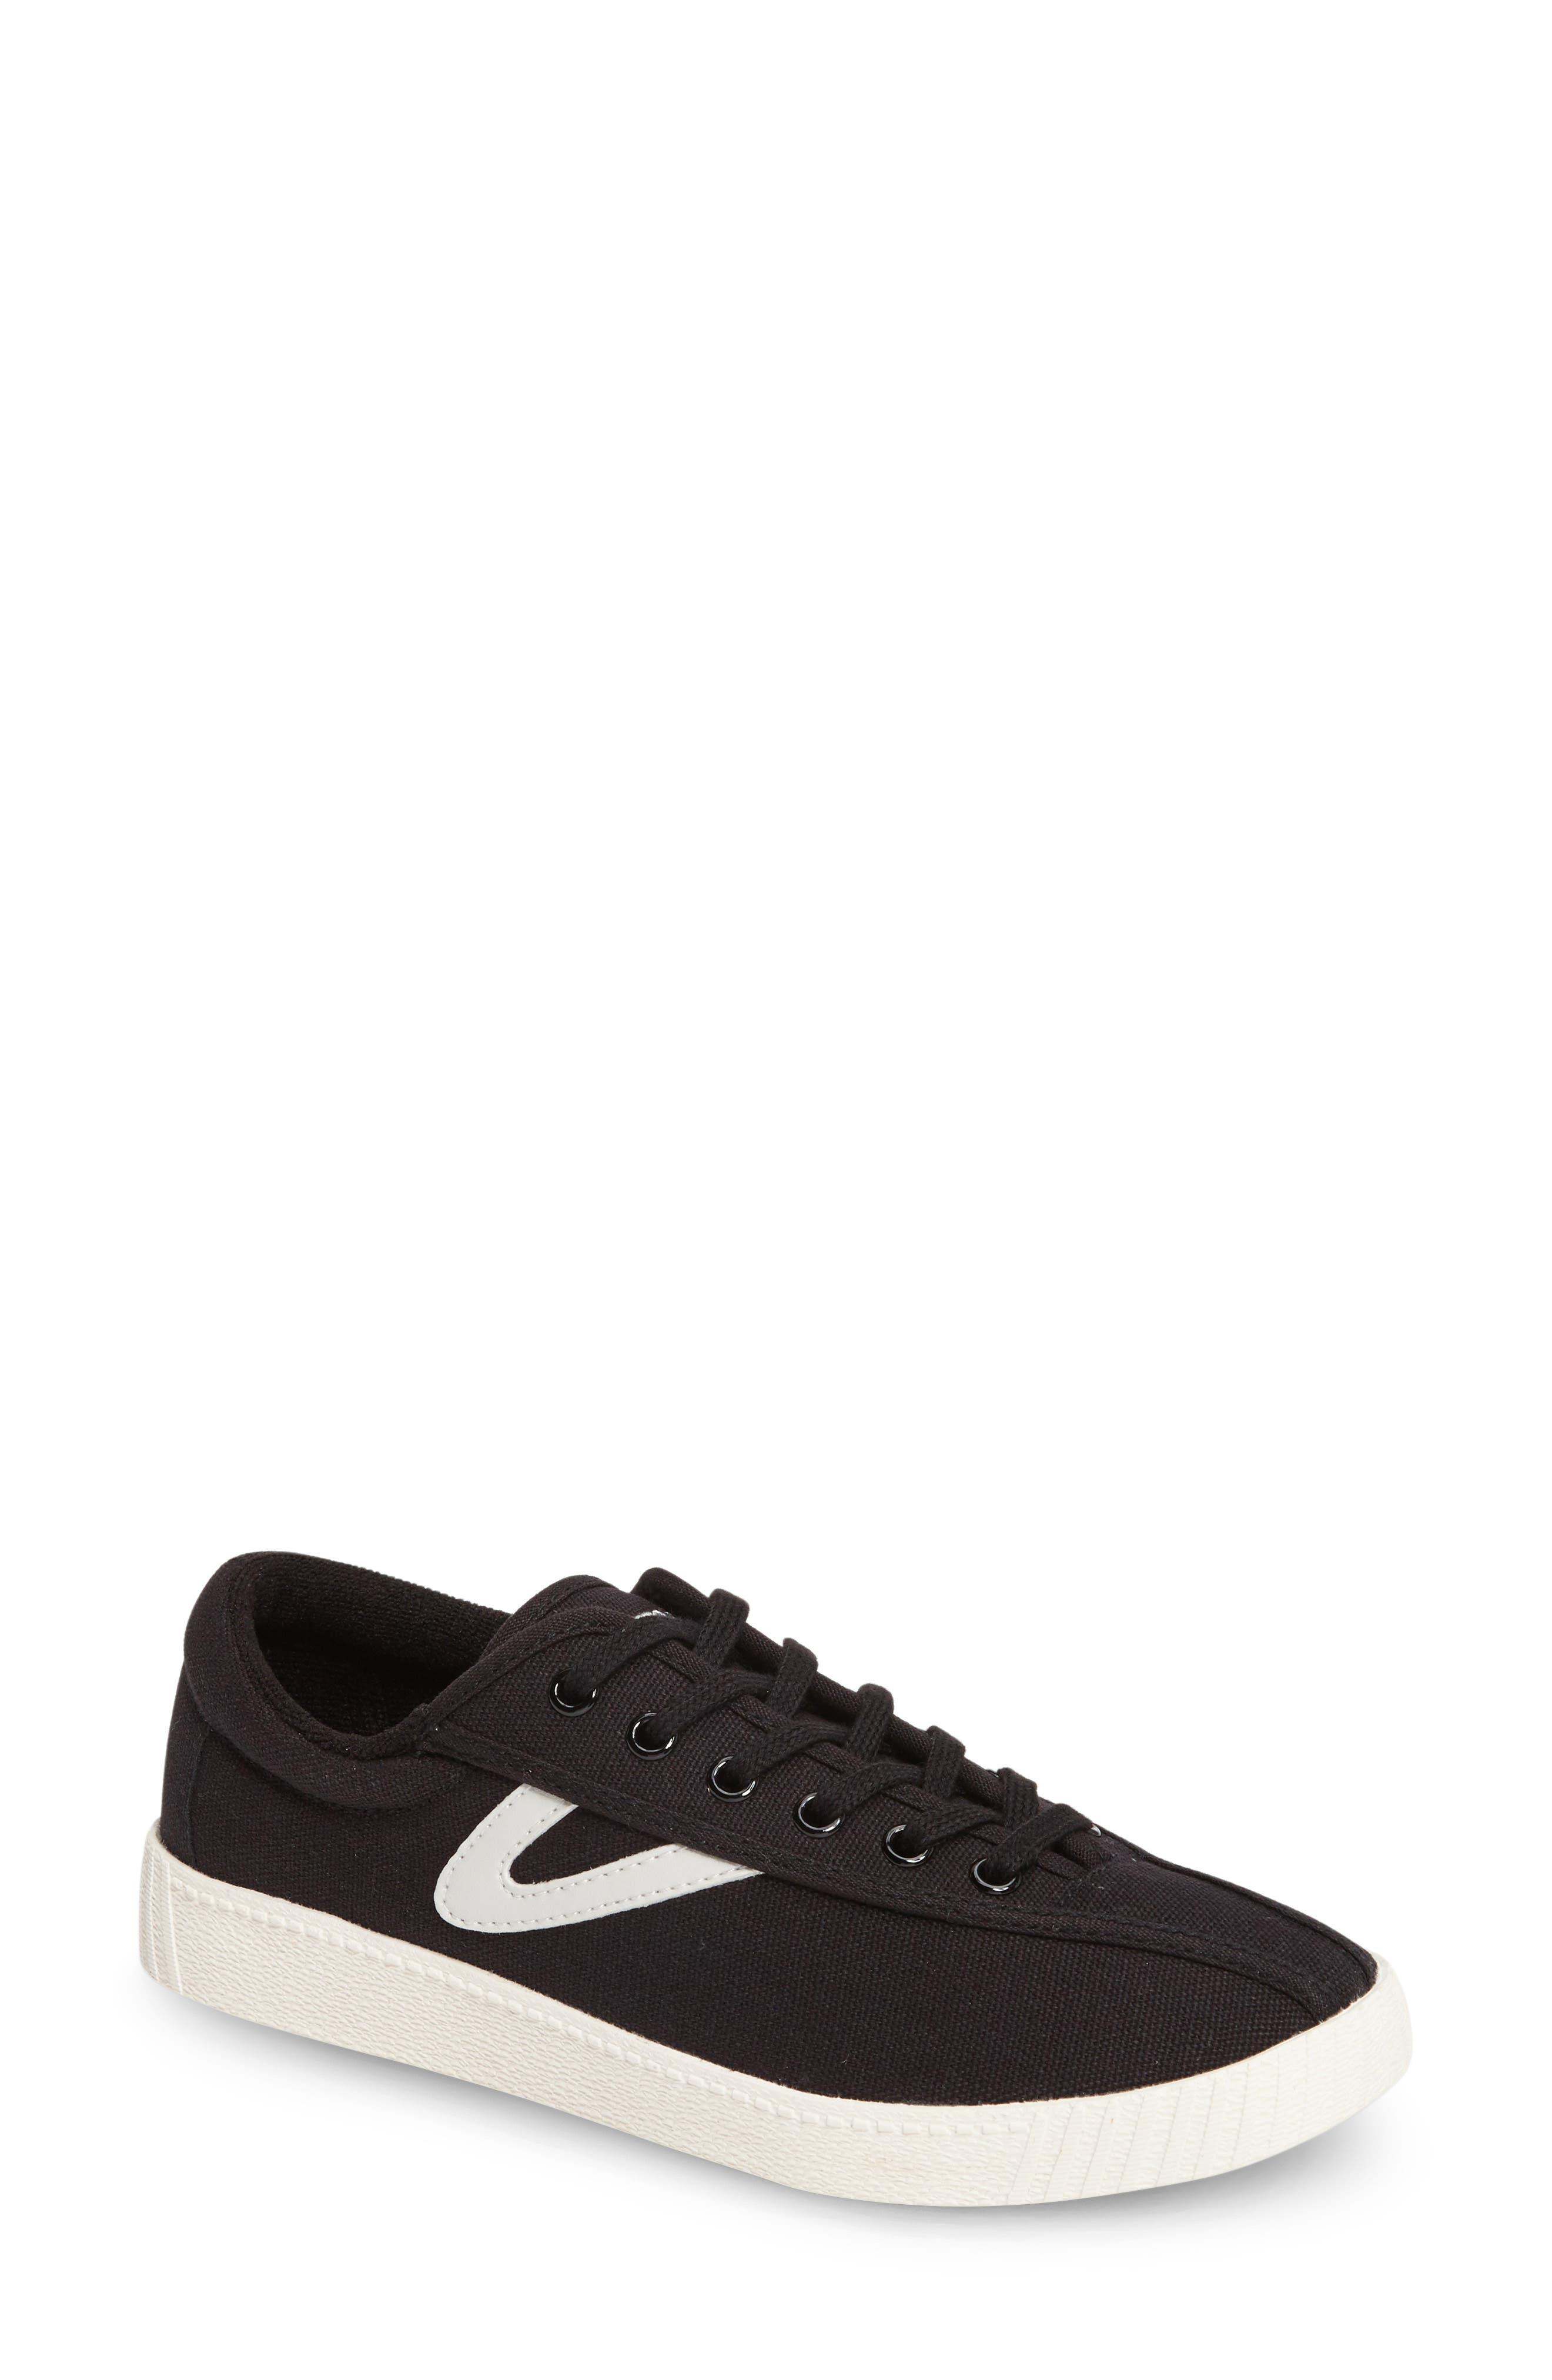 Nylite Plus Sneaker,                         Main,                         color, BLACK/ WHITE